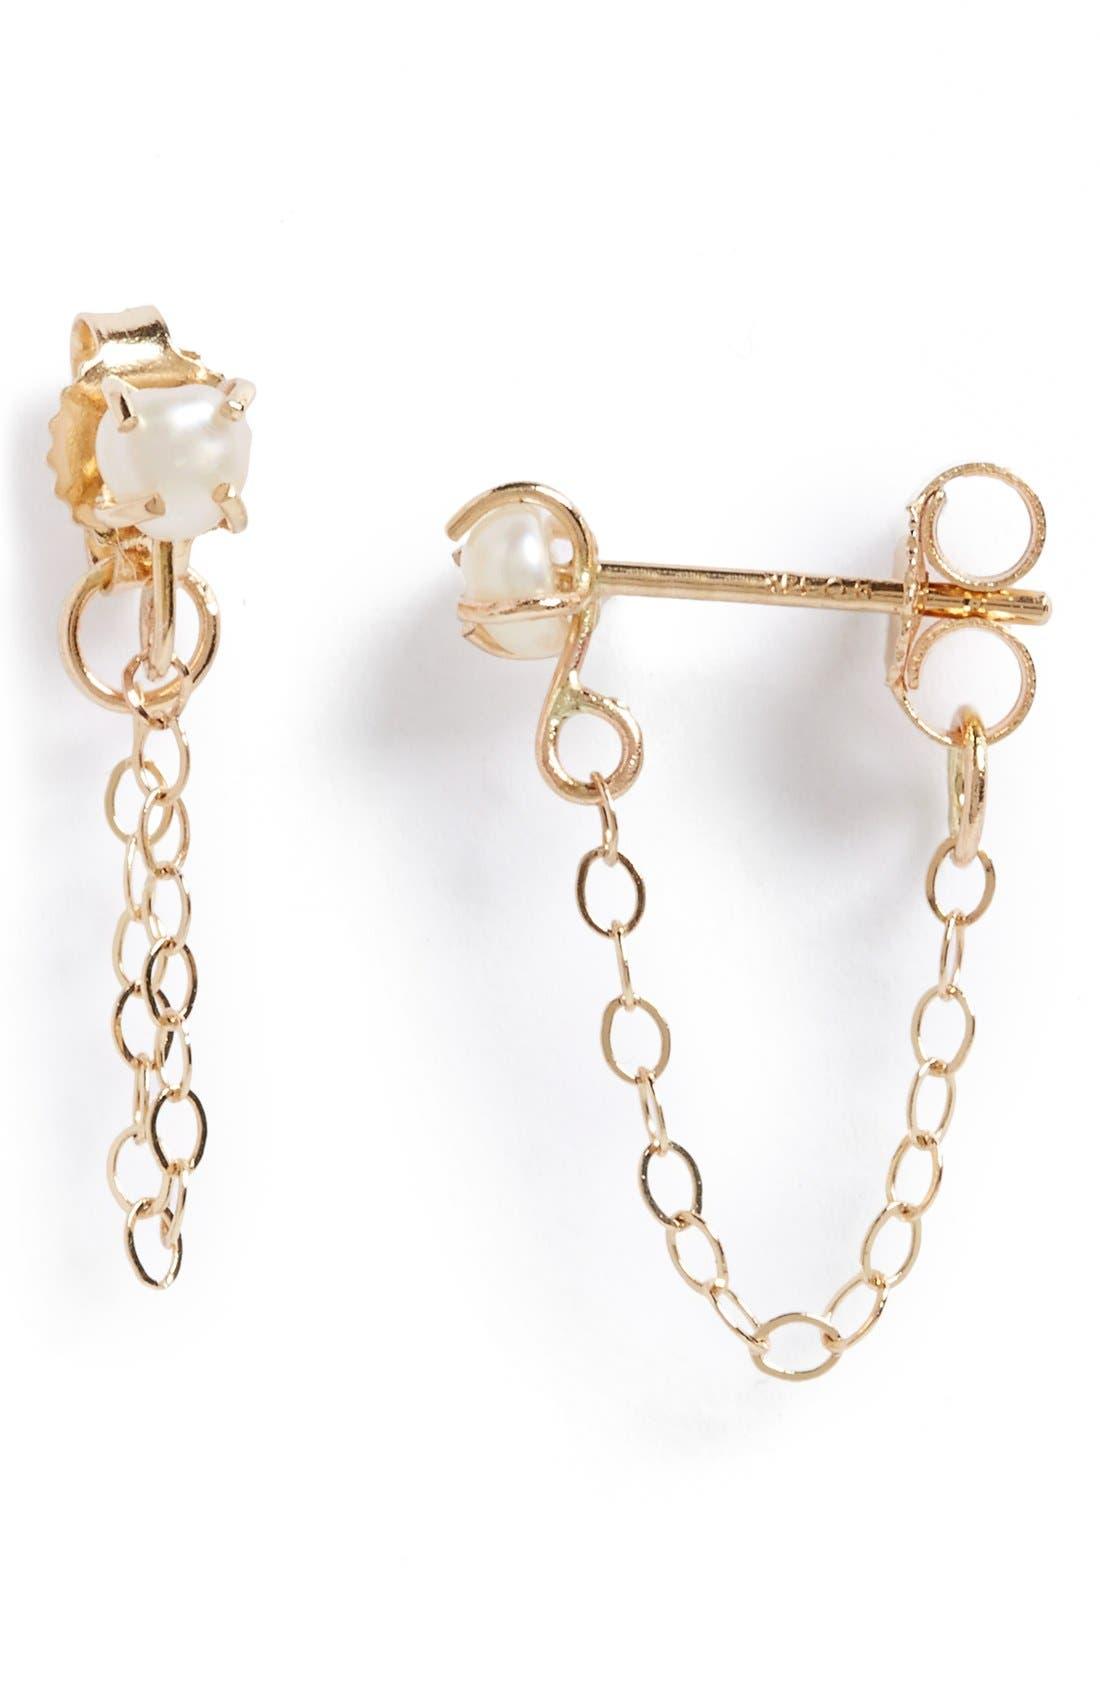 Keshi Pearl Ear Chains,                         Main,                         color, Keshi Pearl/ Yellow Gold